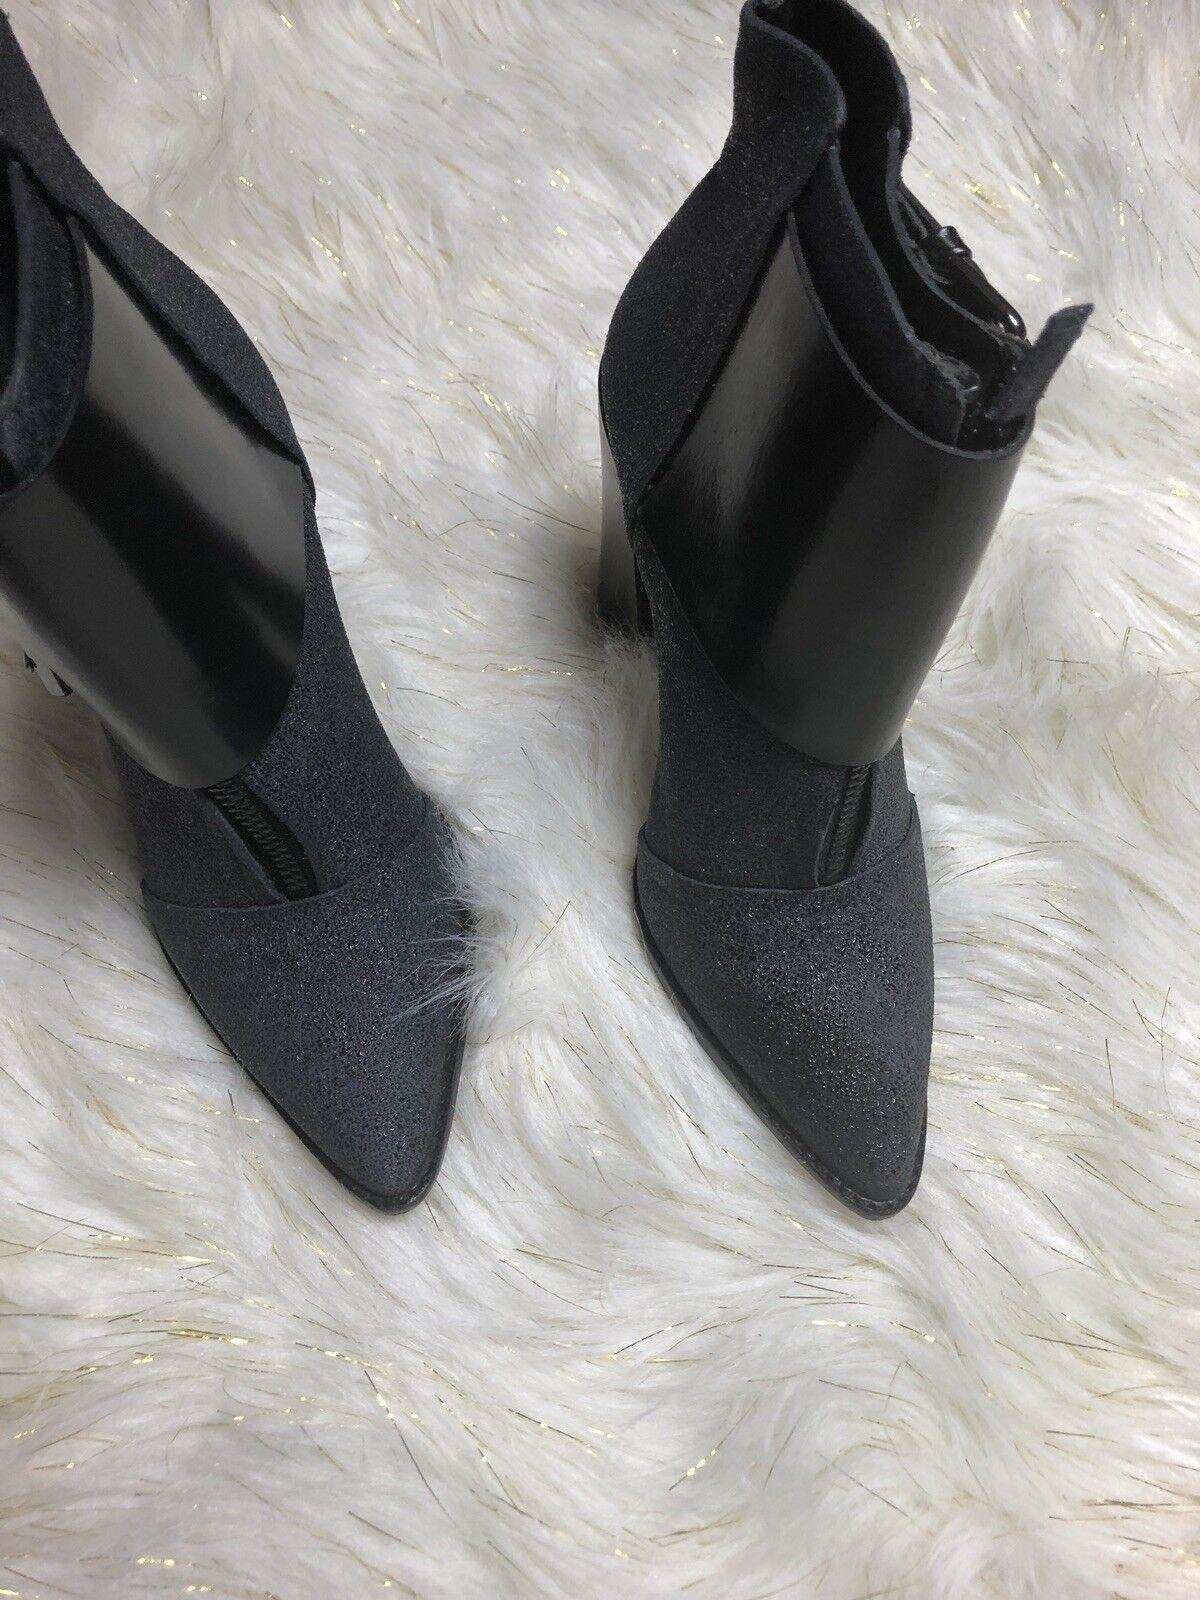 Tibi Piper Größe Blau Booties Ankle Stiefel Größe Piper 35 778bca